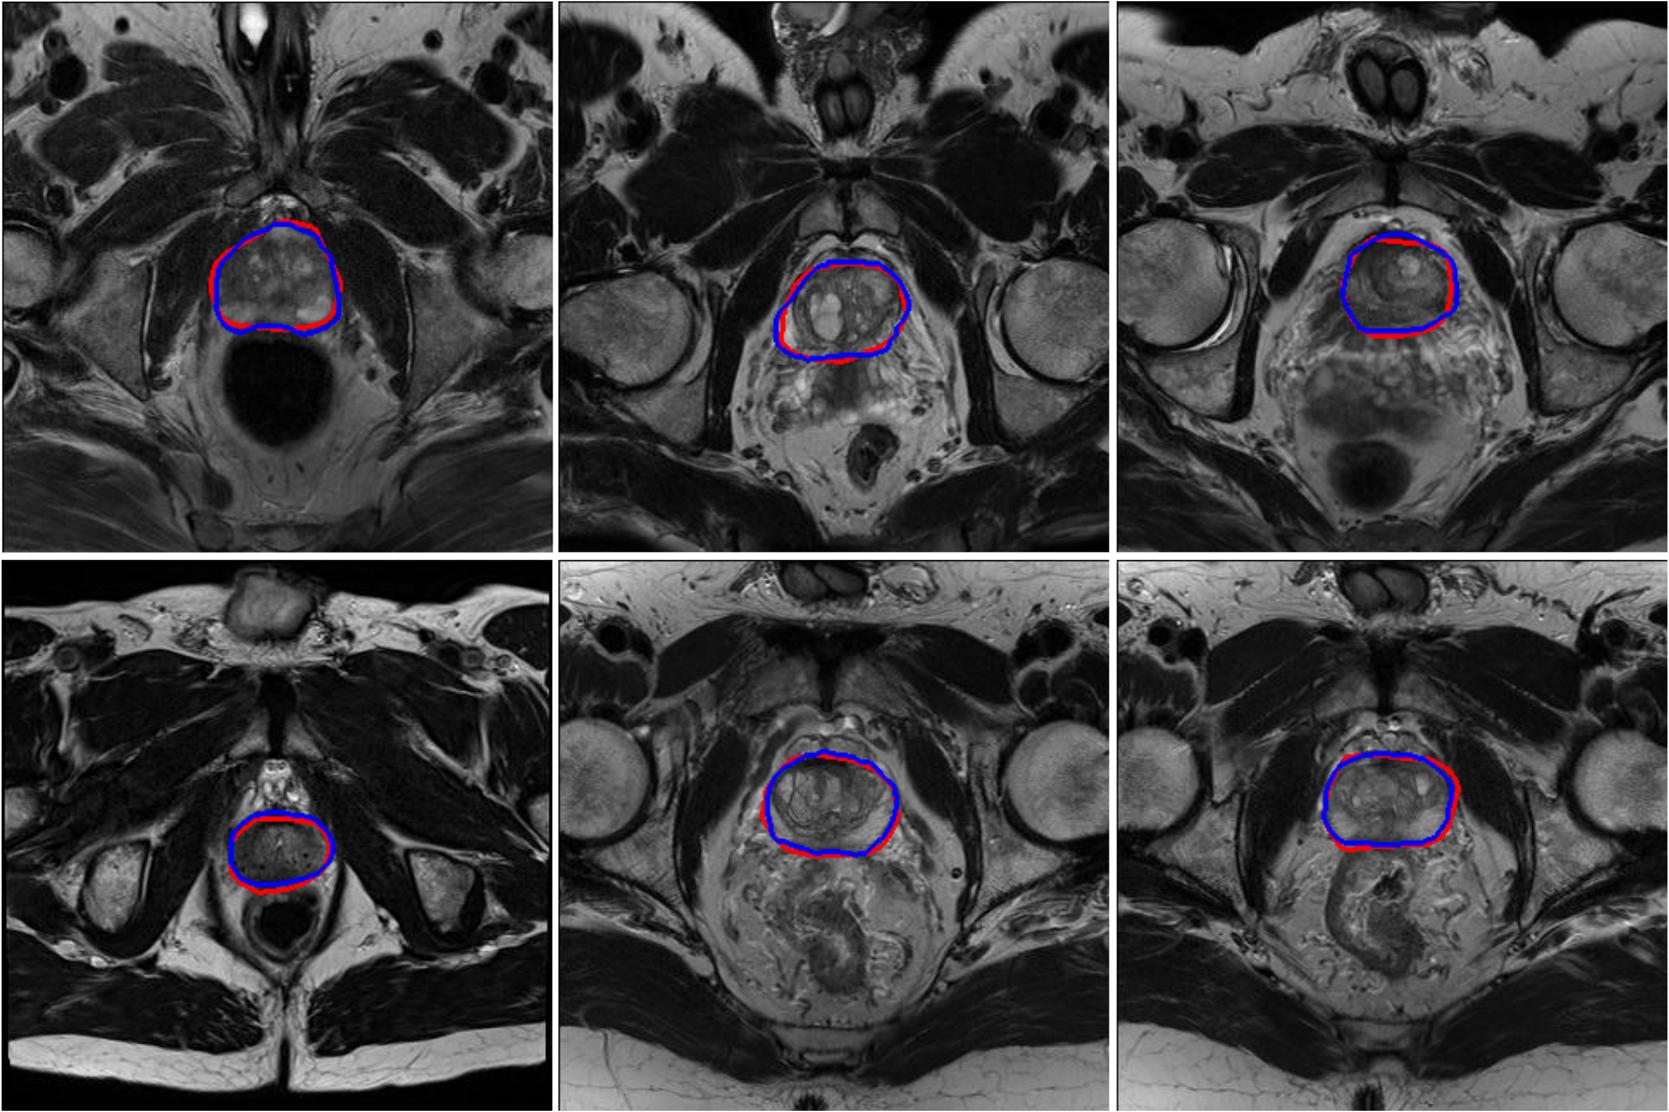 PSNet: prostate segmentation on MRI based on a convolutional neural